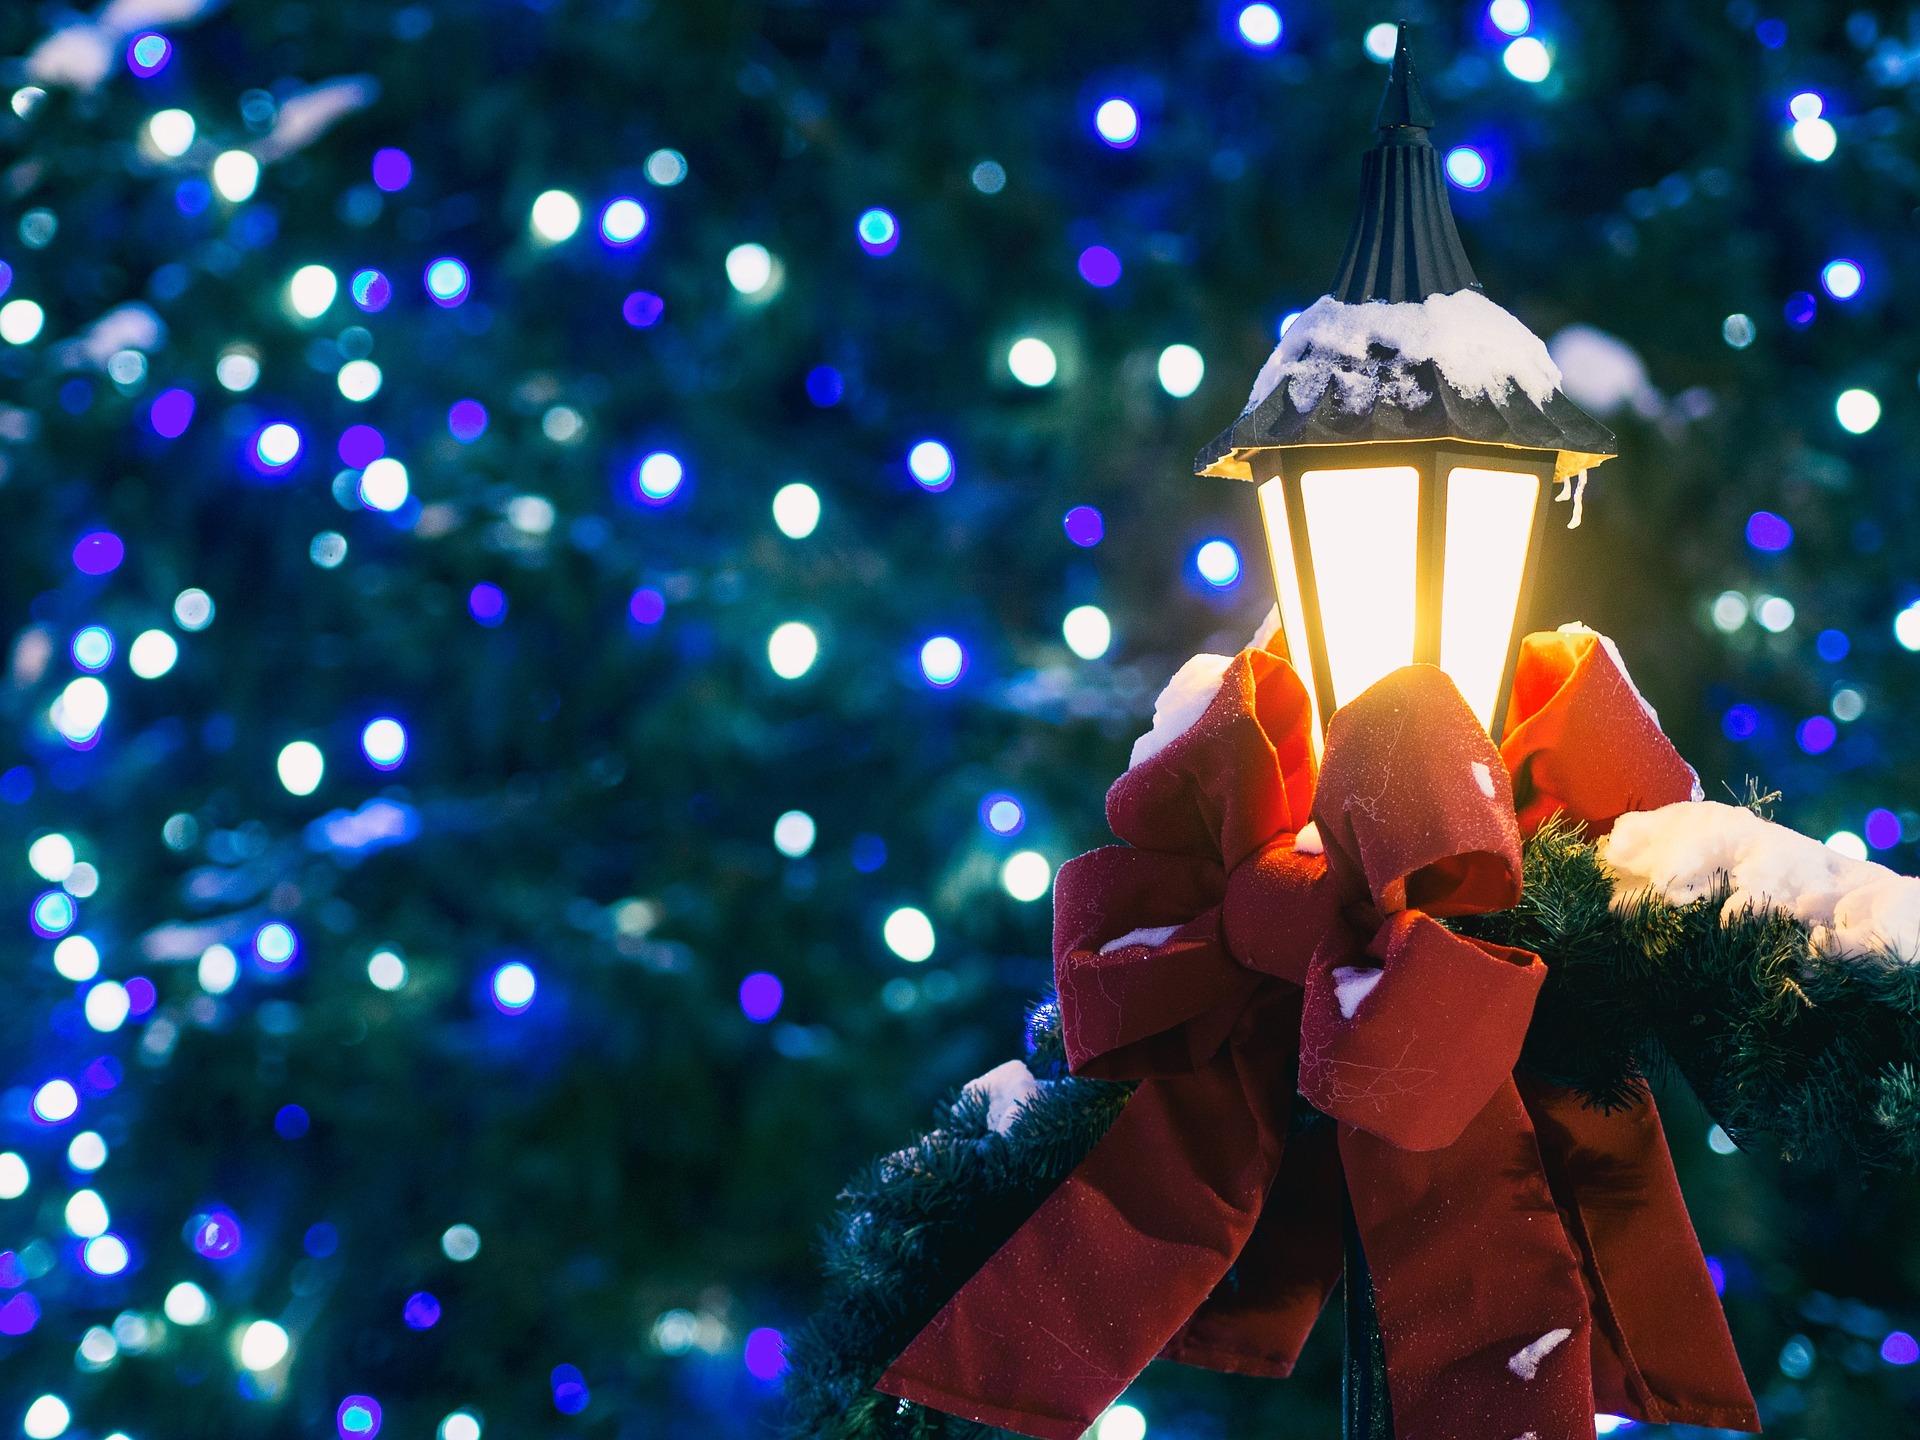 Ira David Wood III's A Christmas Carol